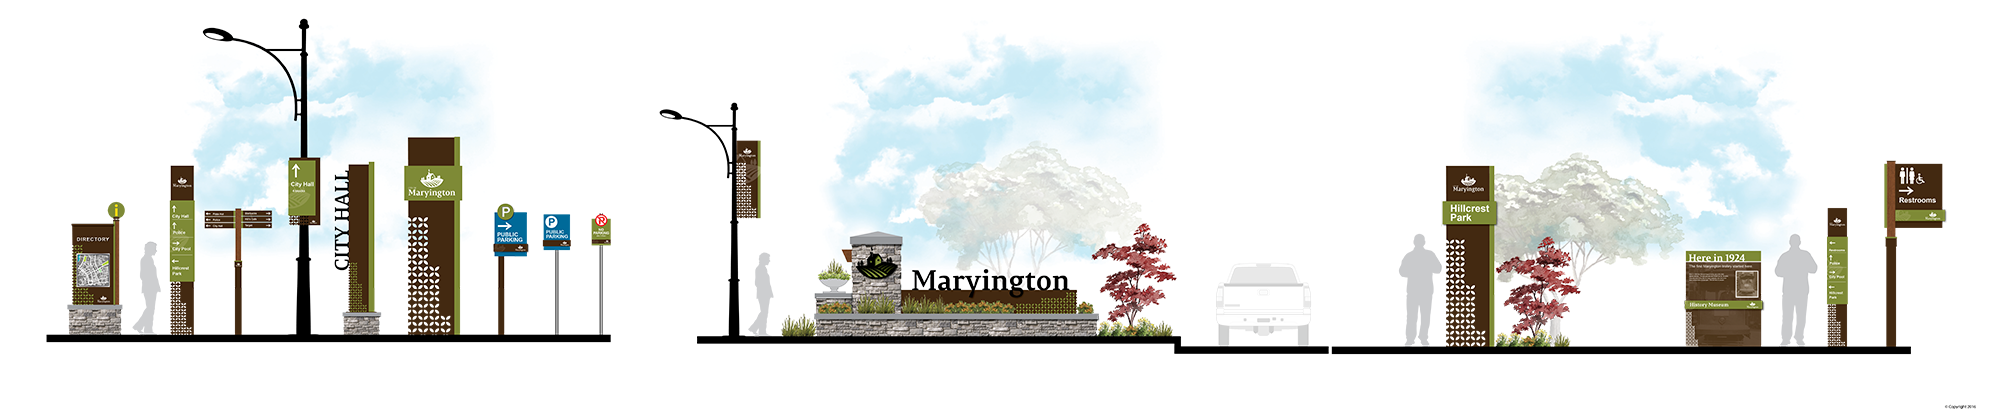 maryington city wayfinding